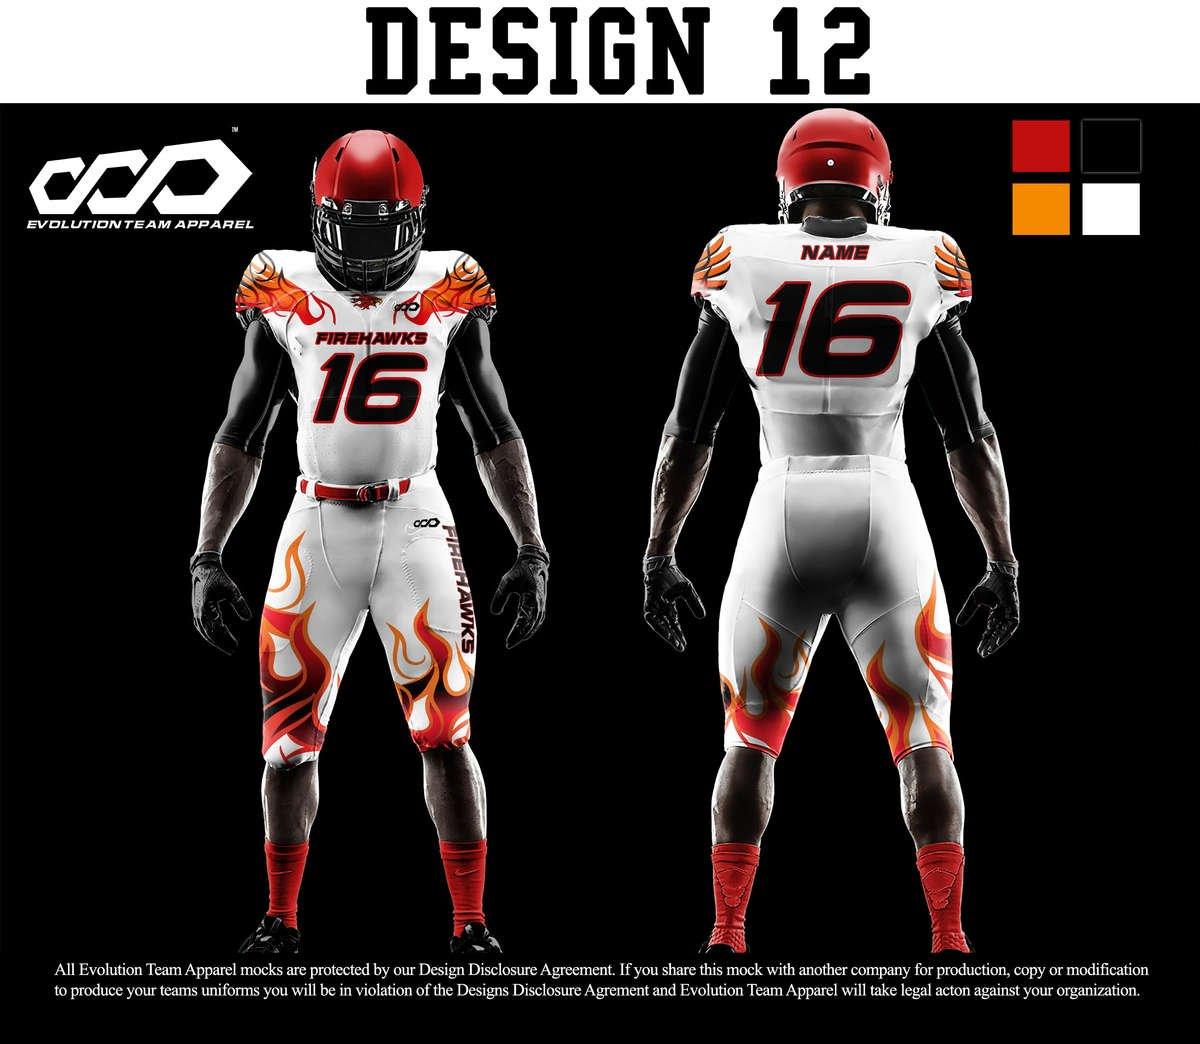 b6079db1138 Full Custom Football Uniforms